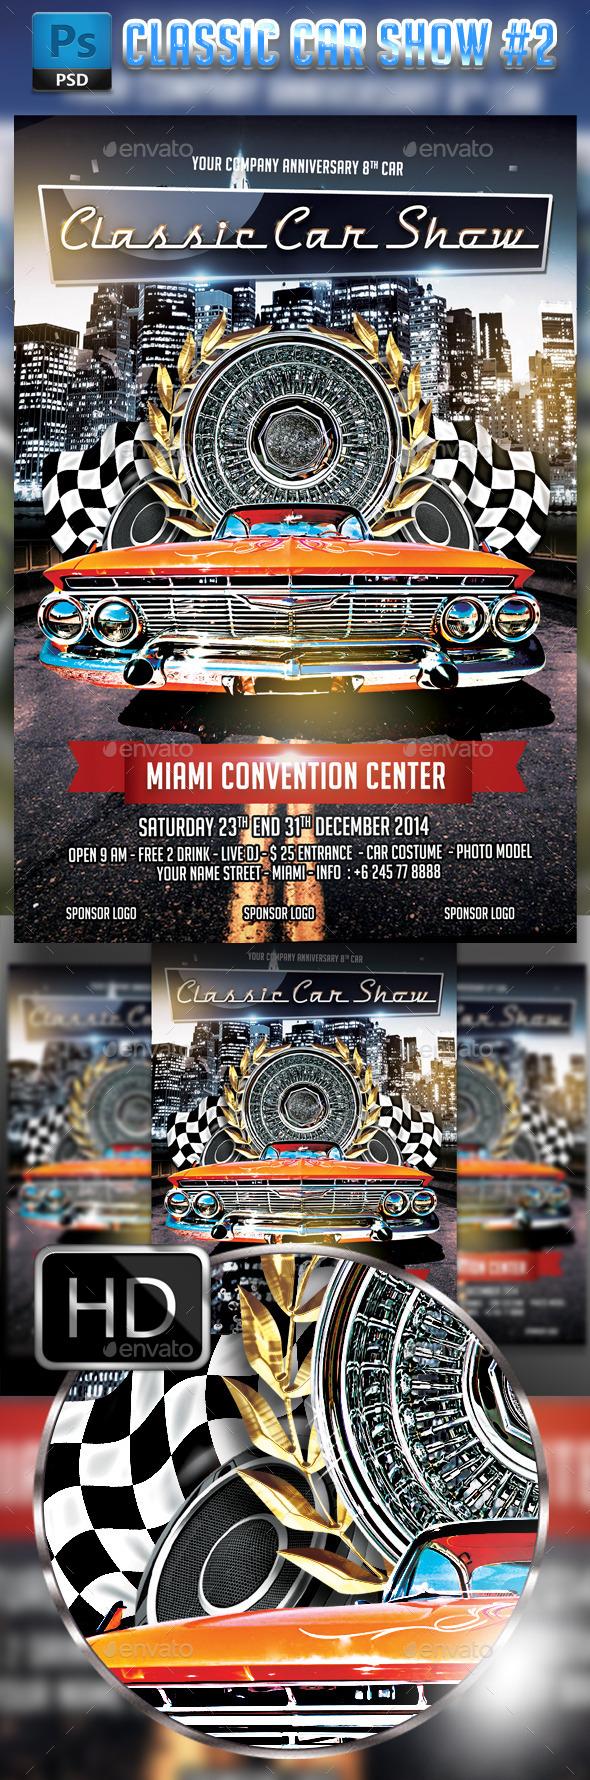 GraphicRiver Classic Car Show flyer #2 8902019